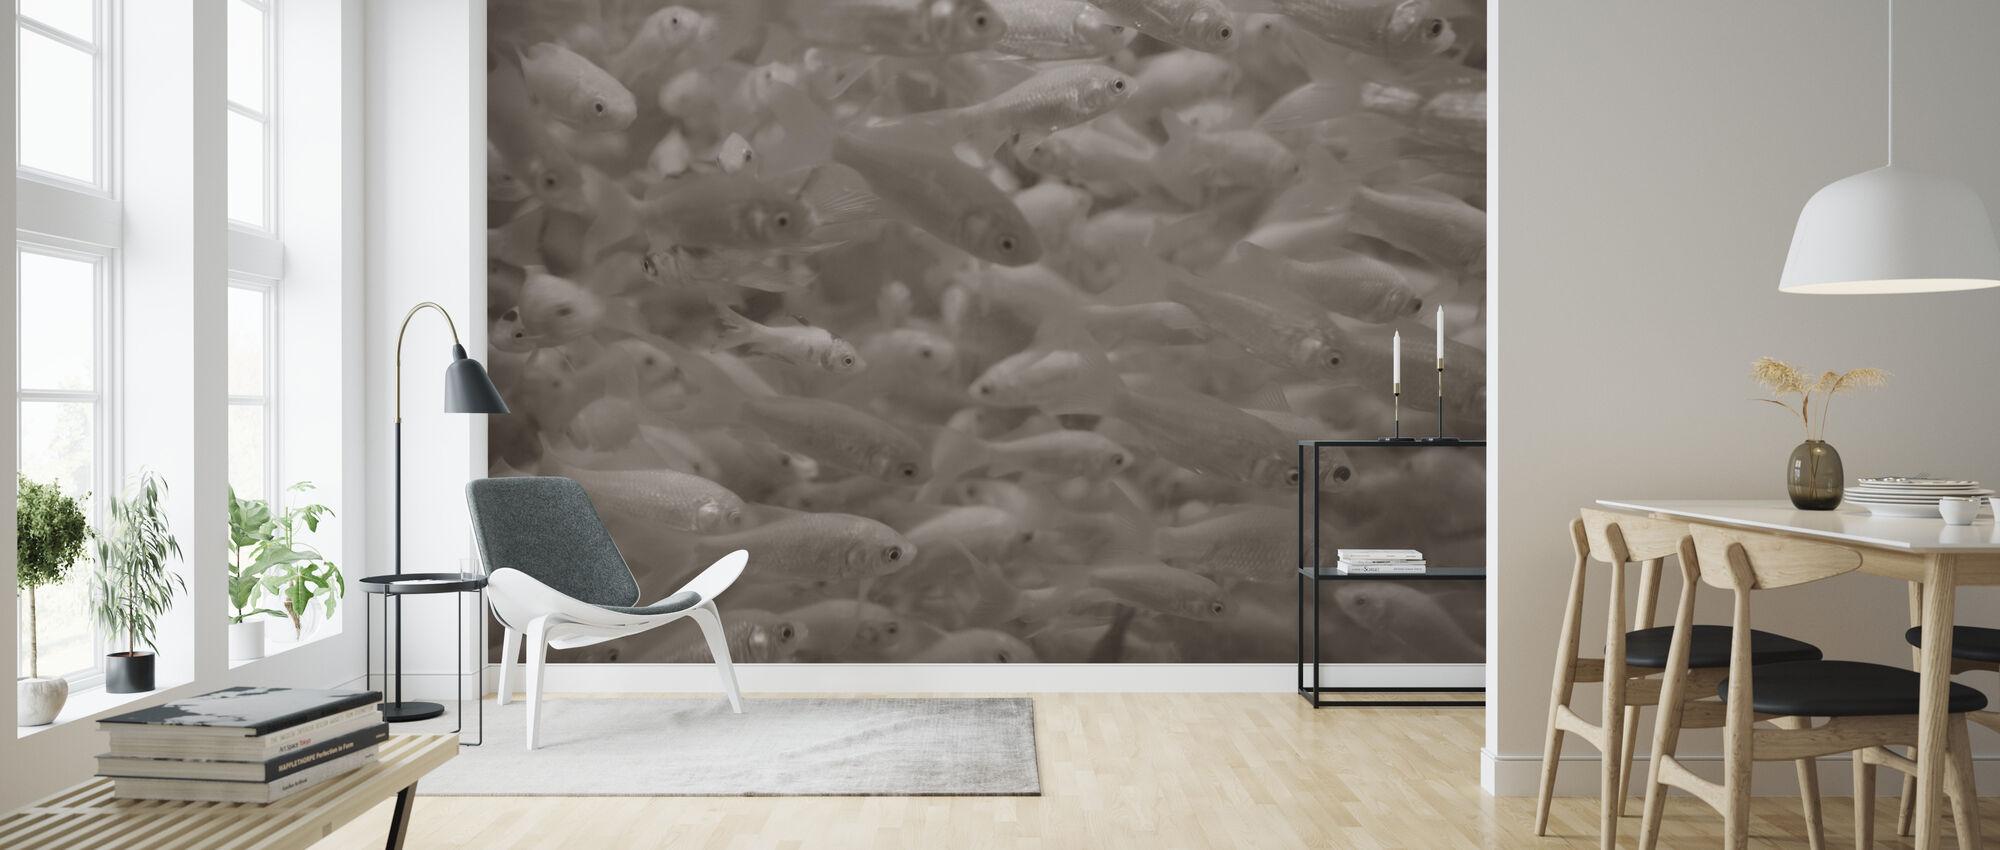 Goldfish - Sepia - Wallpaper - Living Room